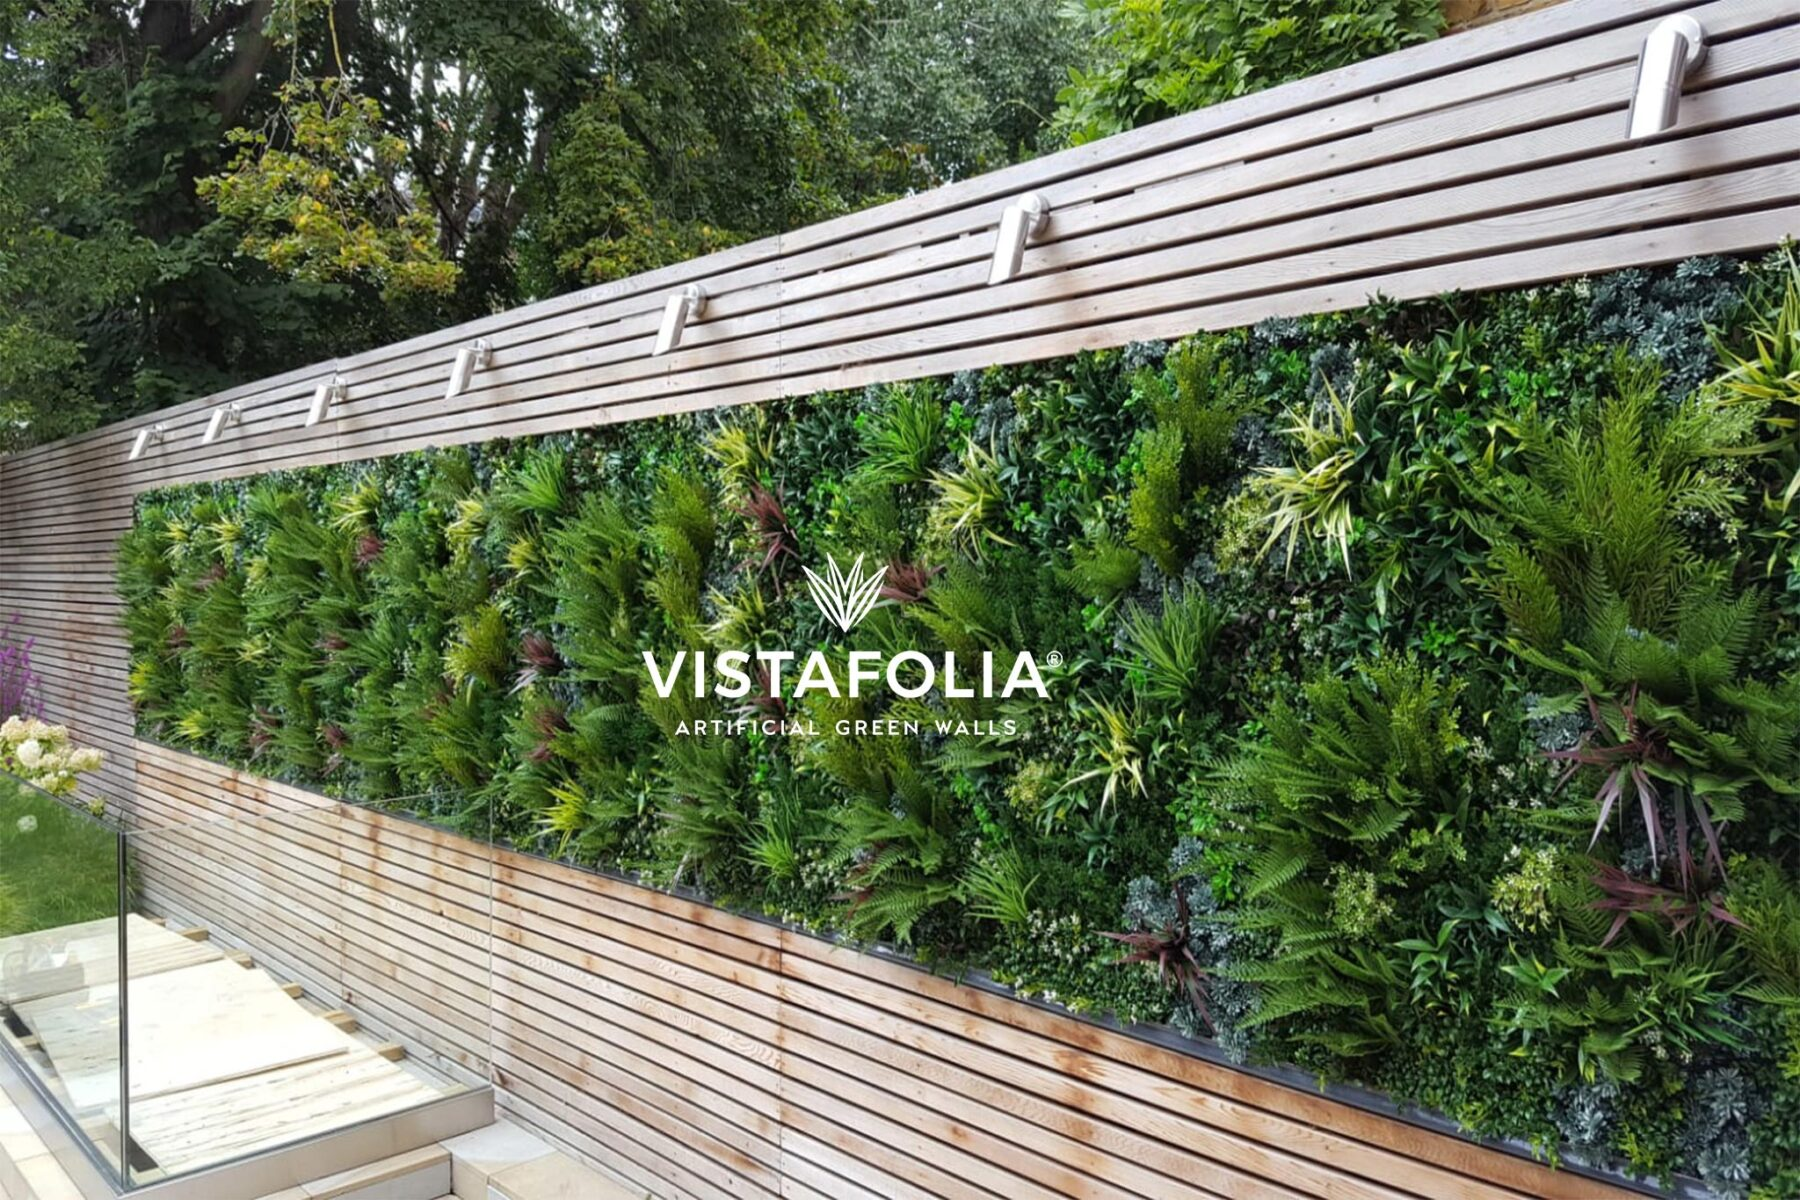 vistafolia, artificial green walls installation